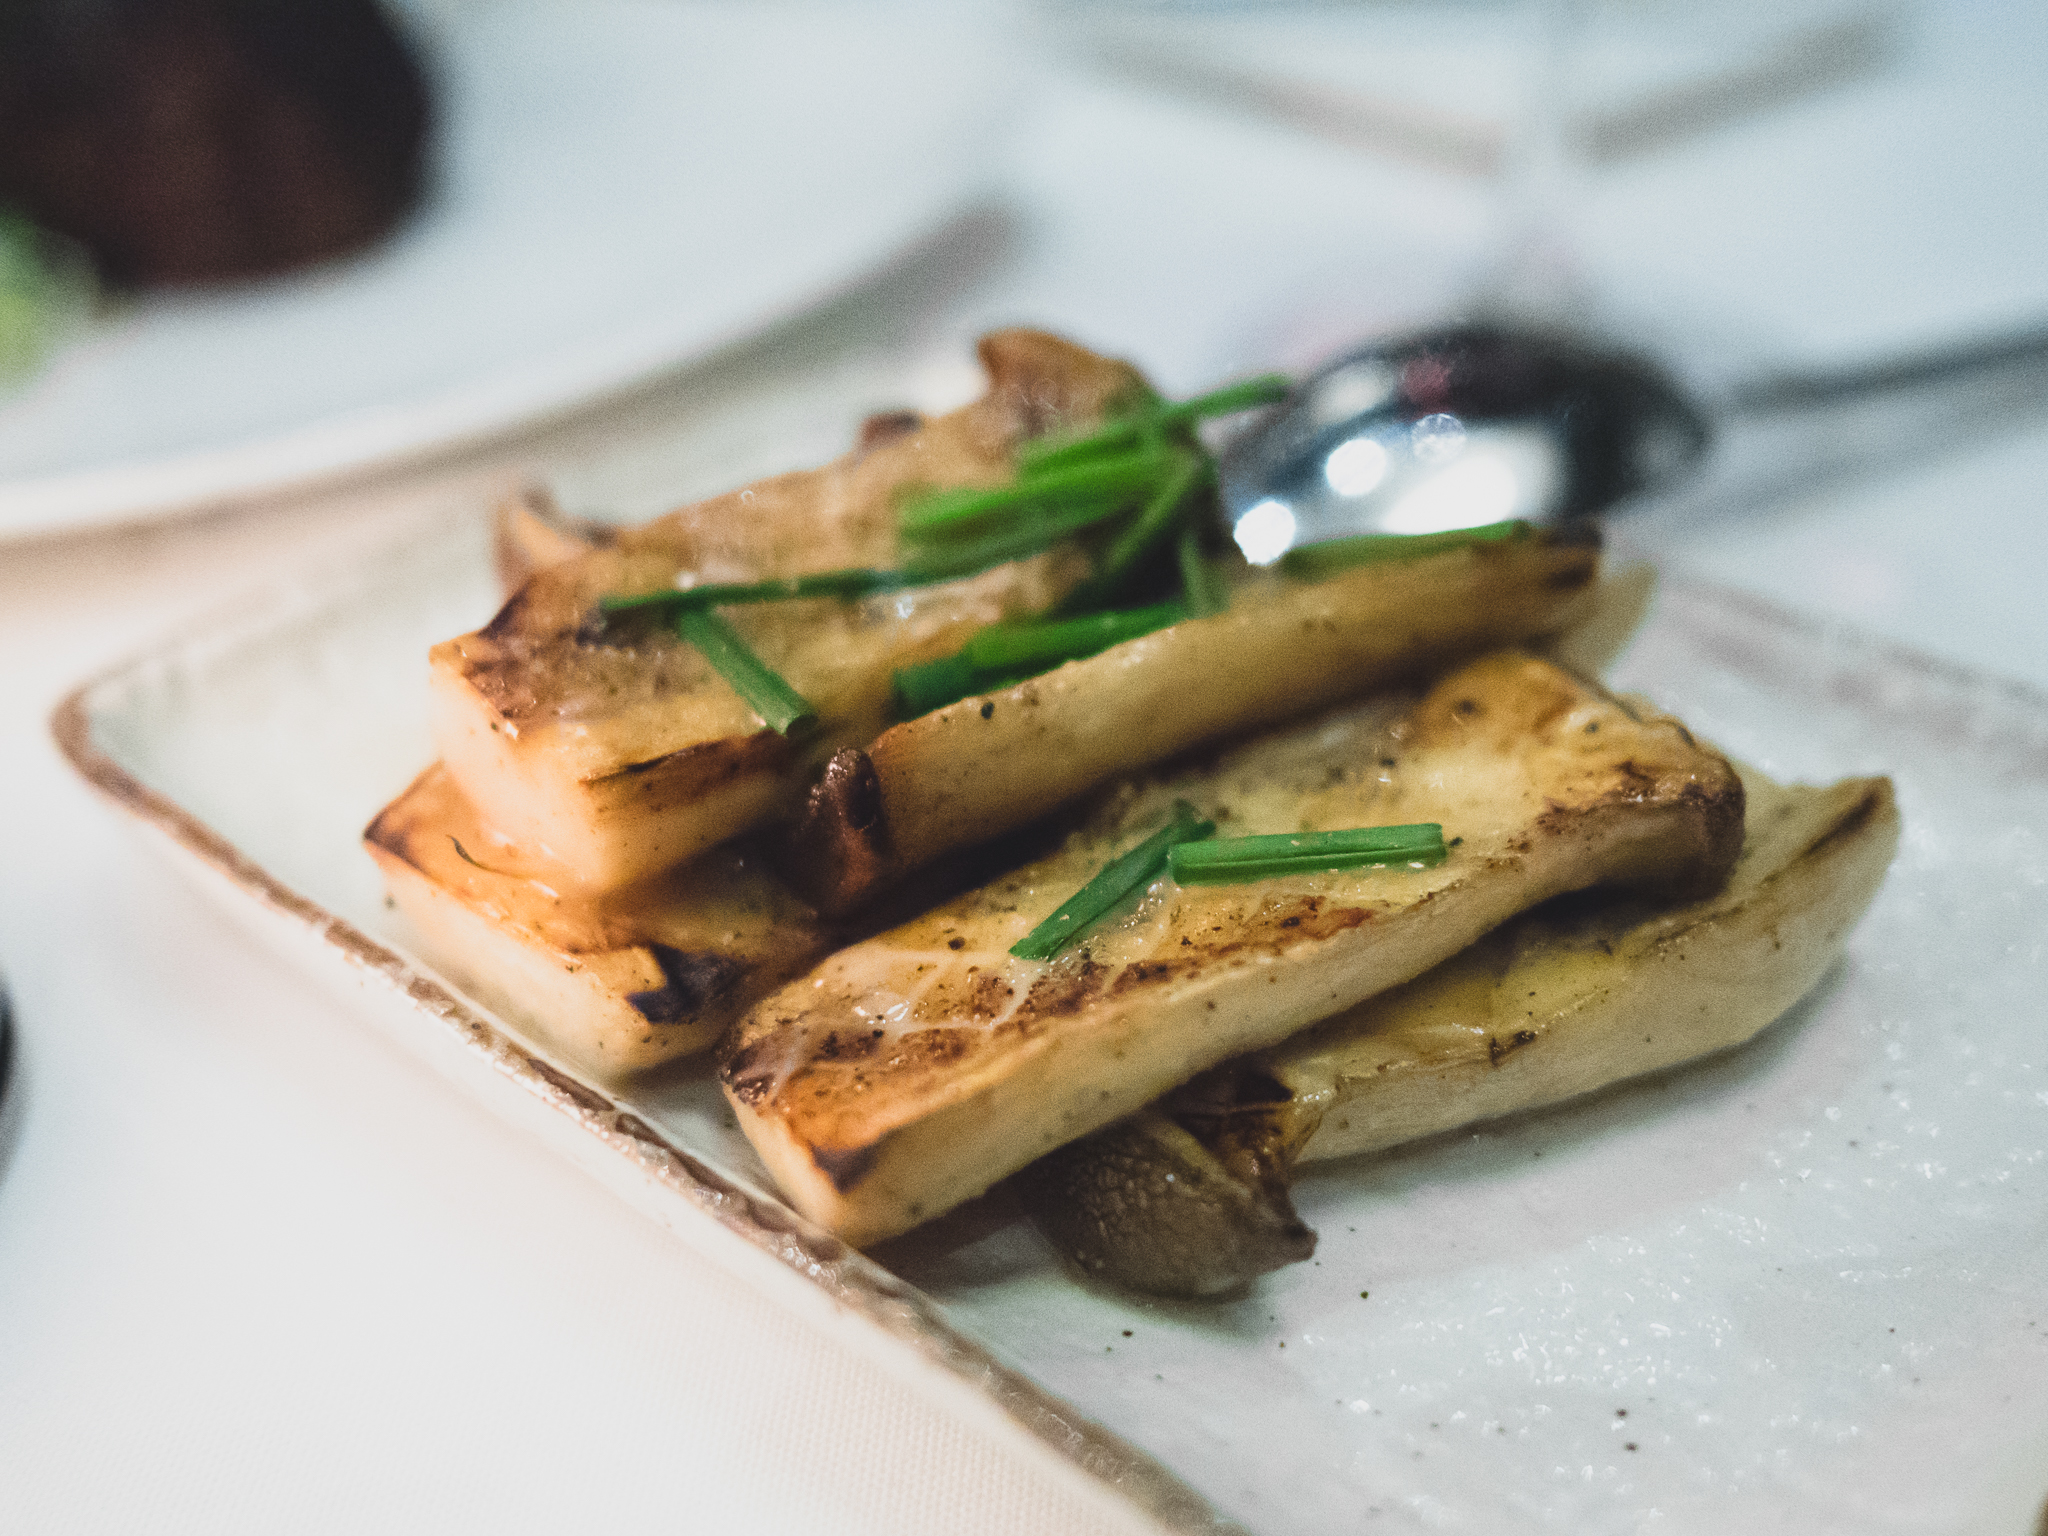 eryngi mushrooms with roasted garlic, thyme and lemon vinaigrette.